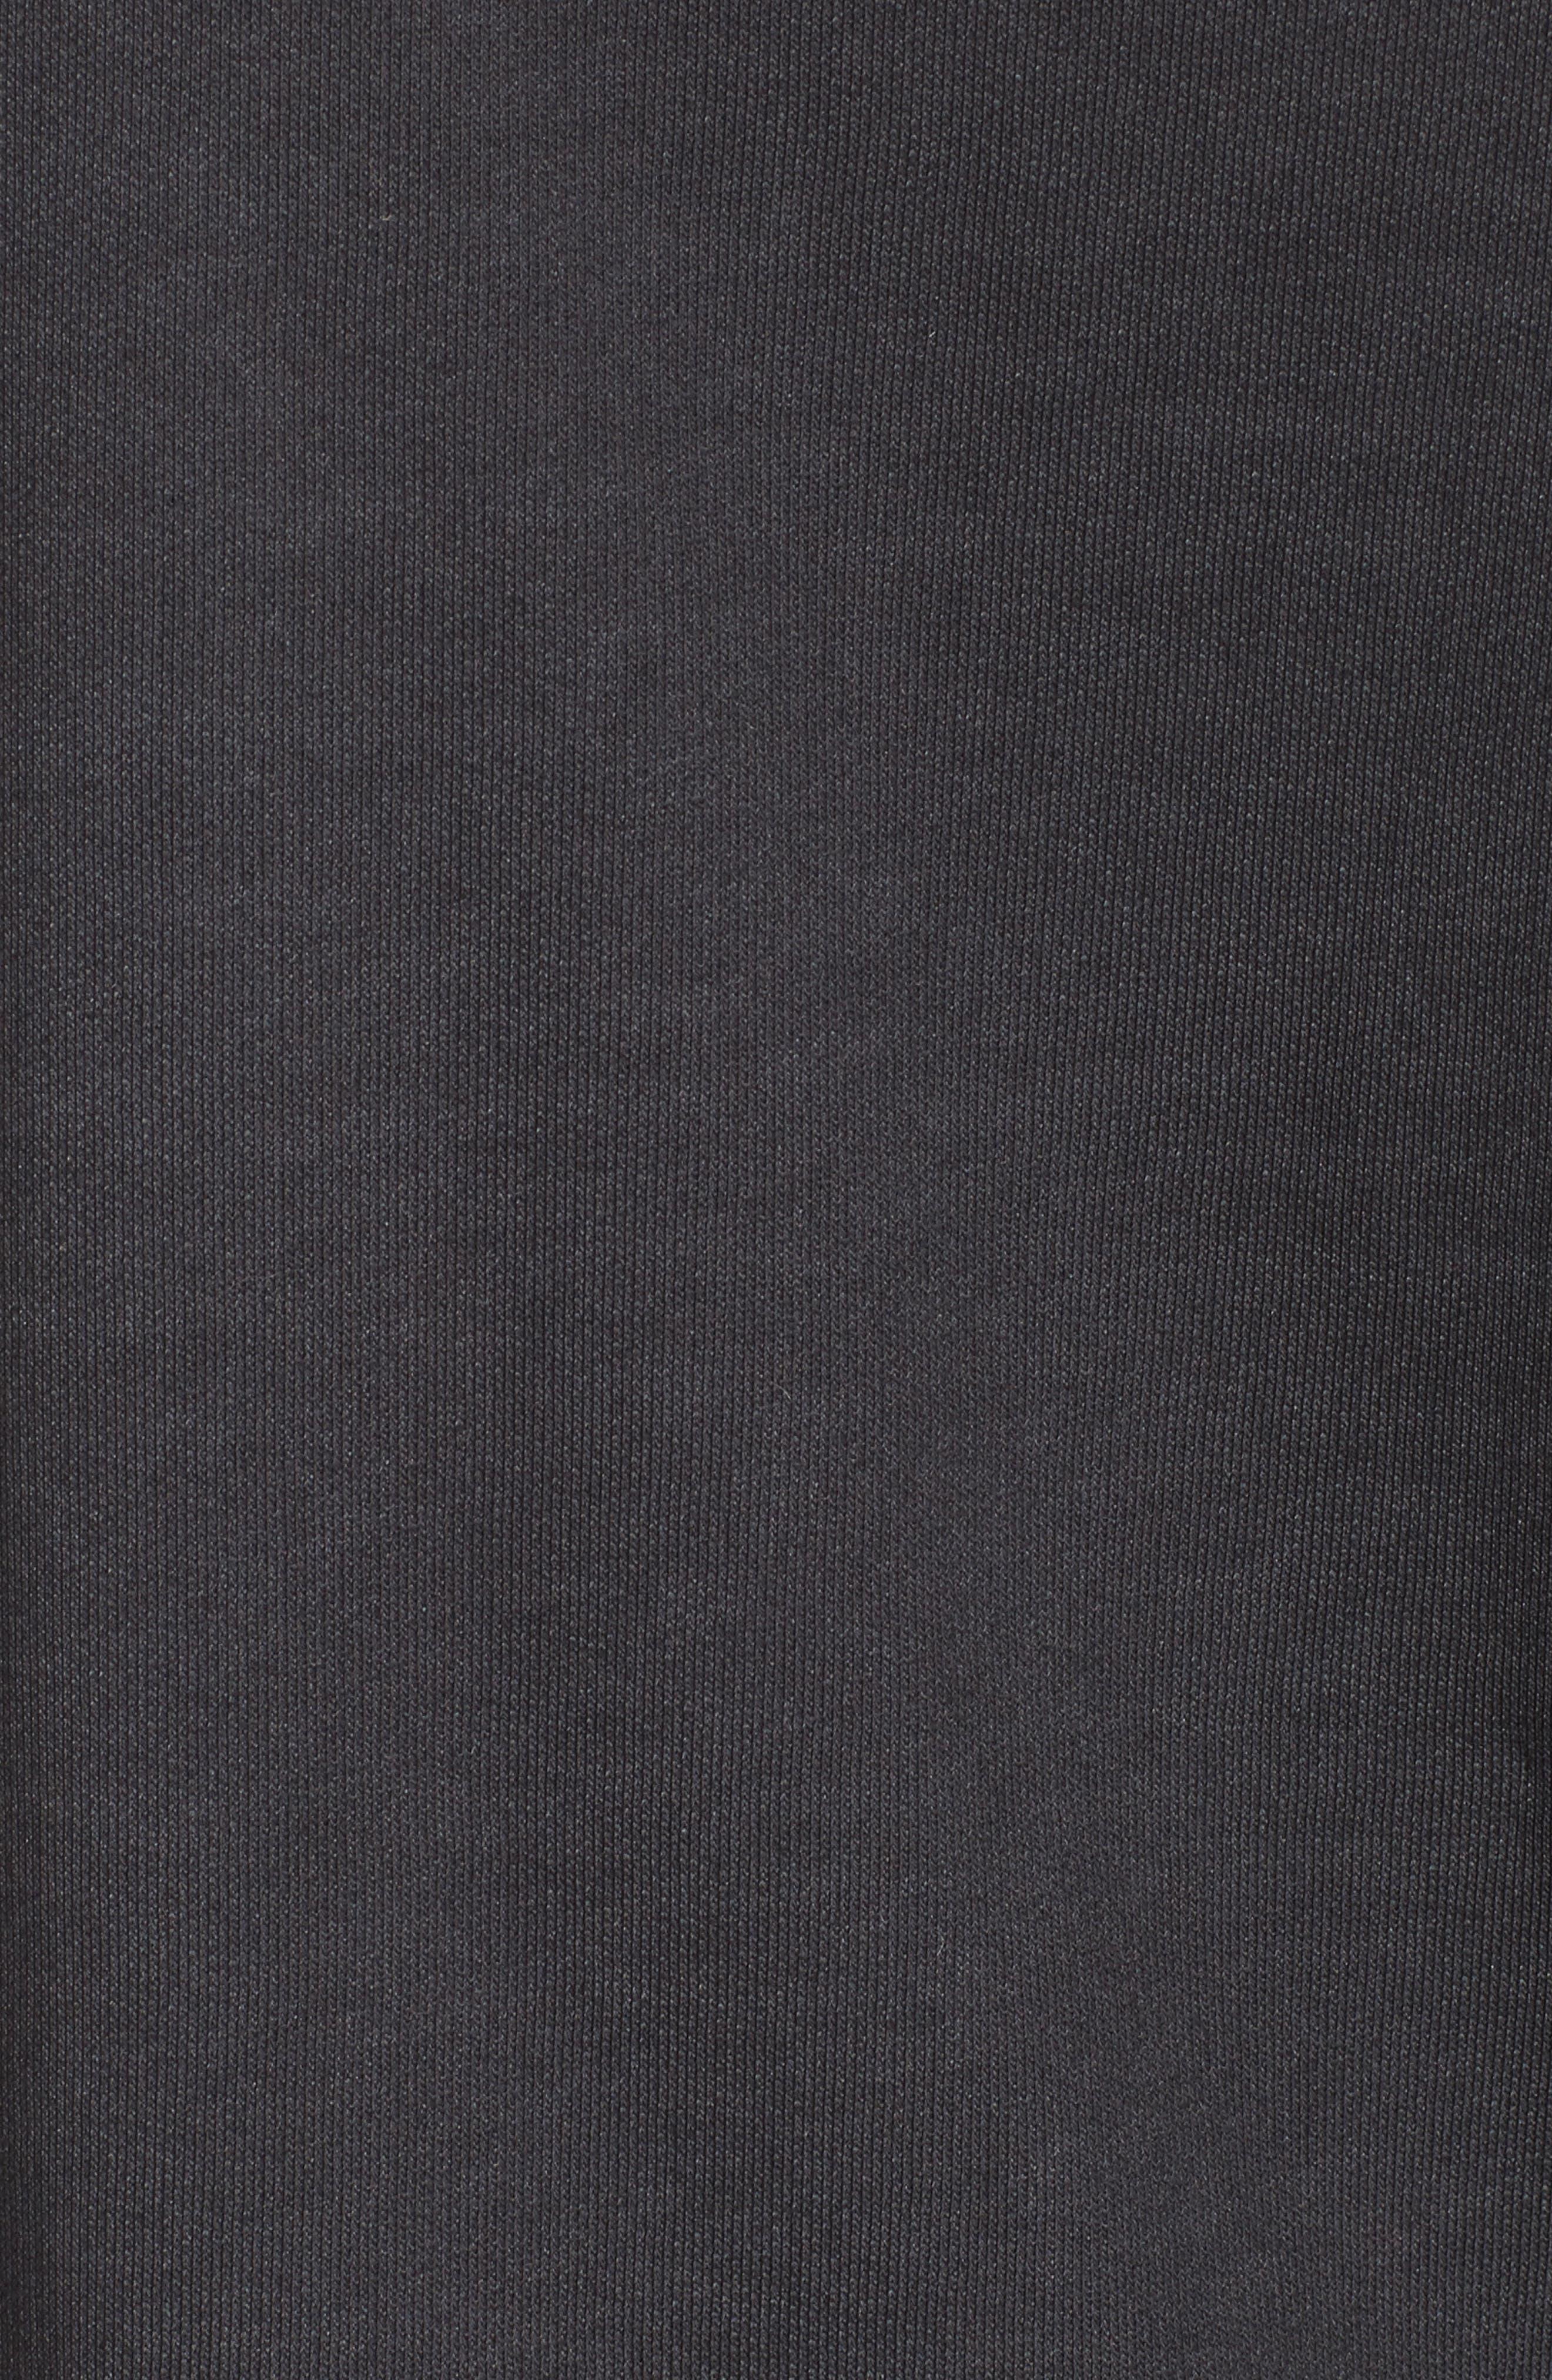 Cozy Stencil Sweatshirt,                             Alternate thumbnail 5, color,                             001